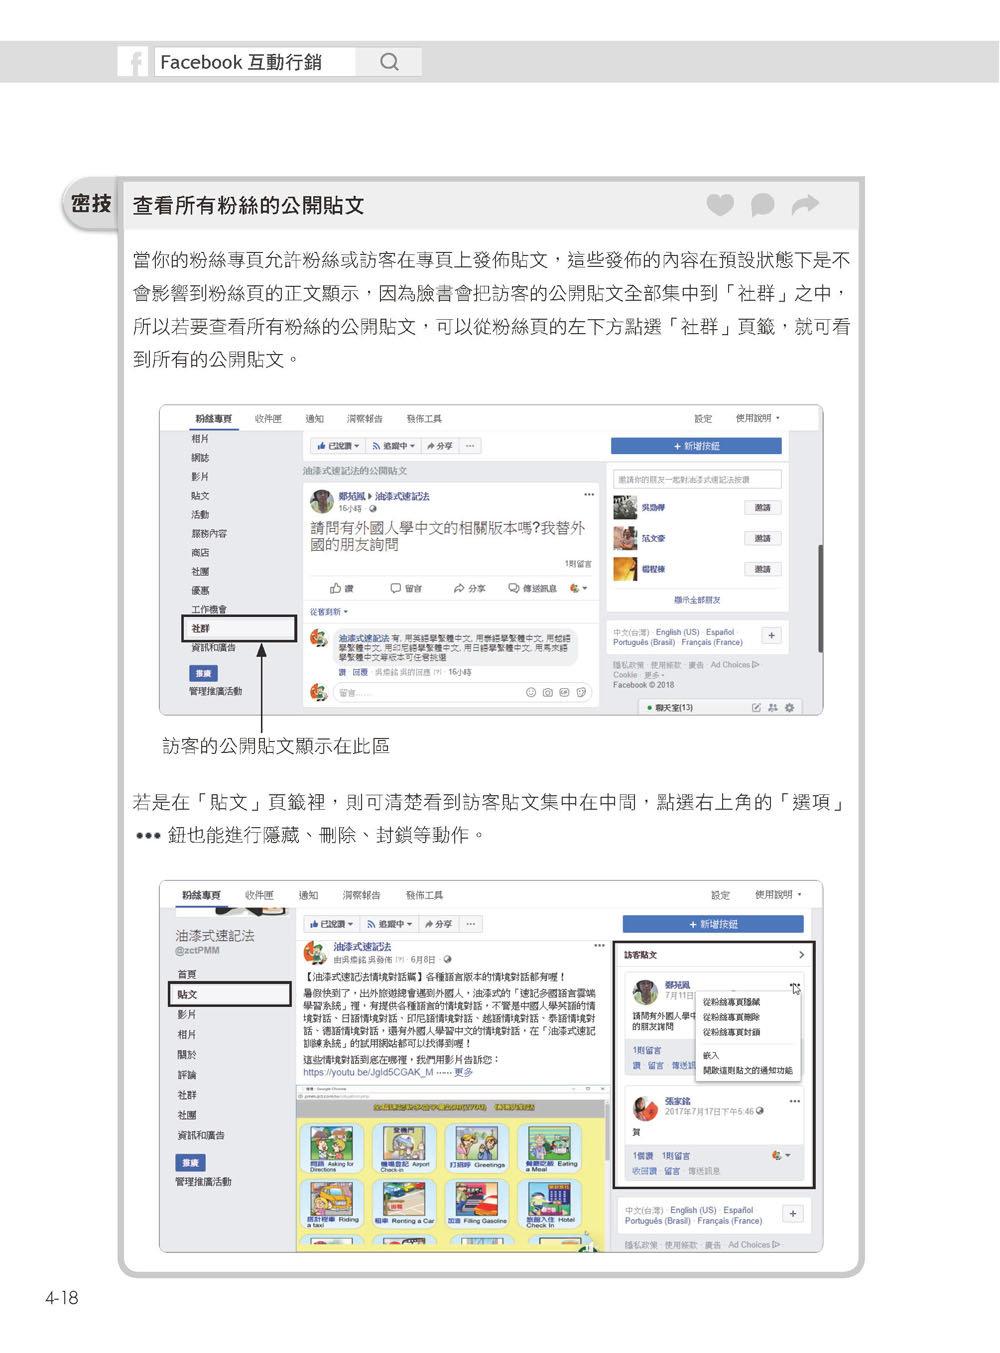 Facebook 互動行銷:社群口碑經營新思路+廣告投放如何有成效,想做好臉書行銷,操作心法就在這!-preview-5